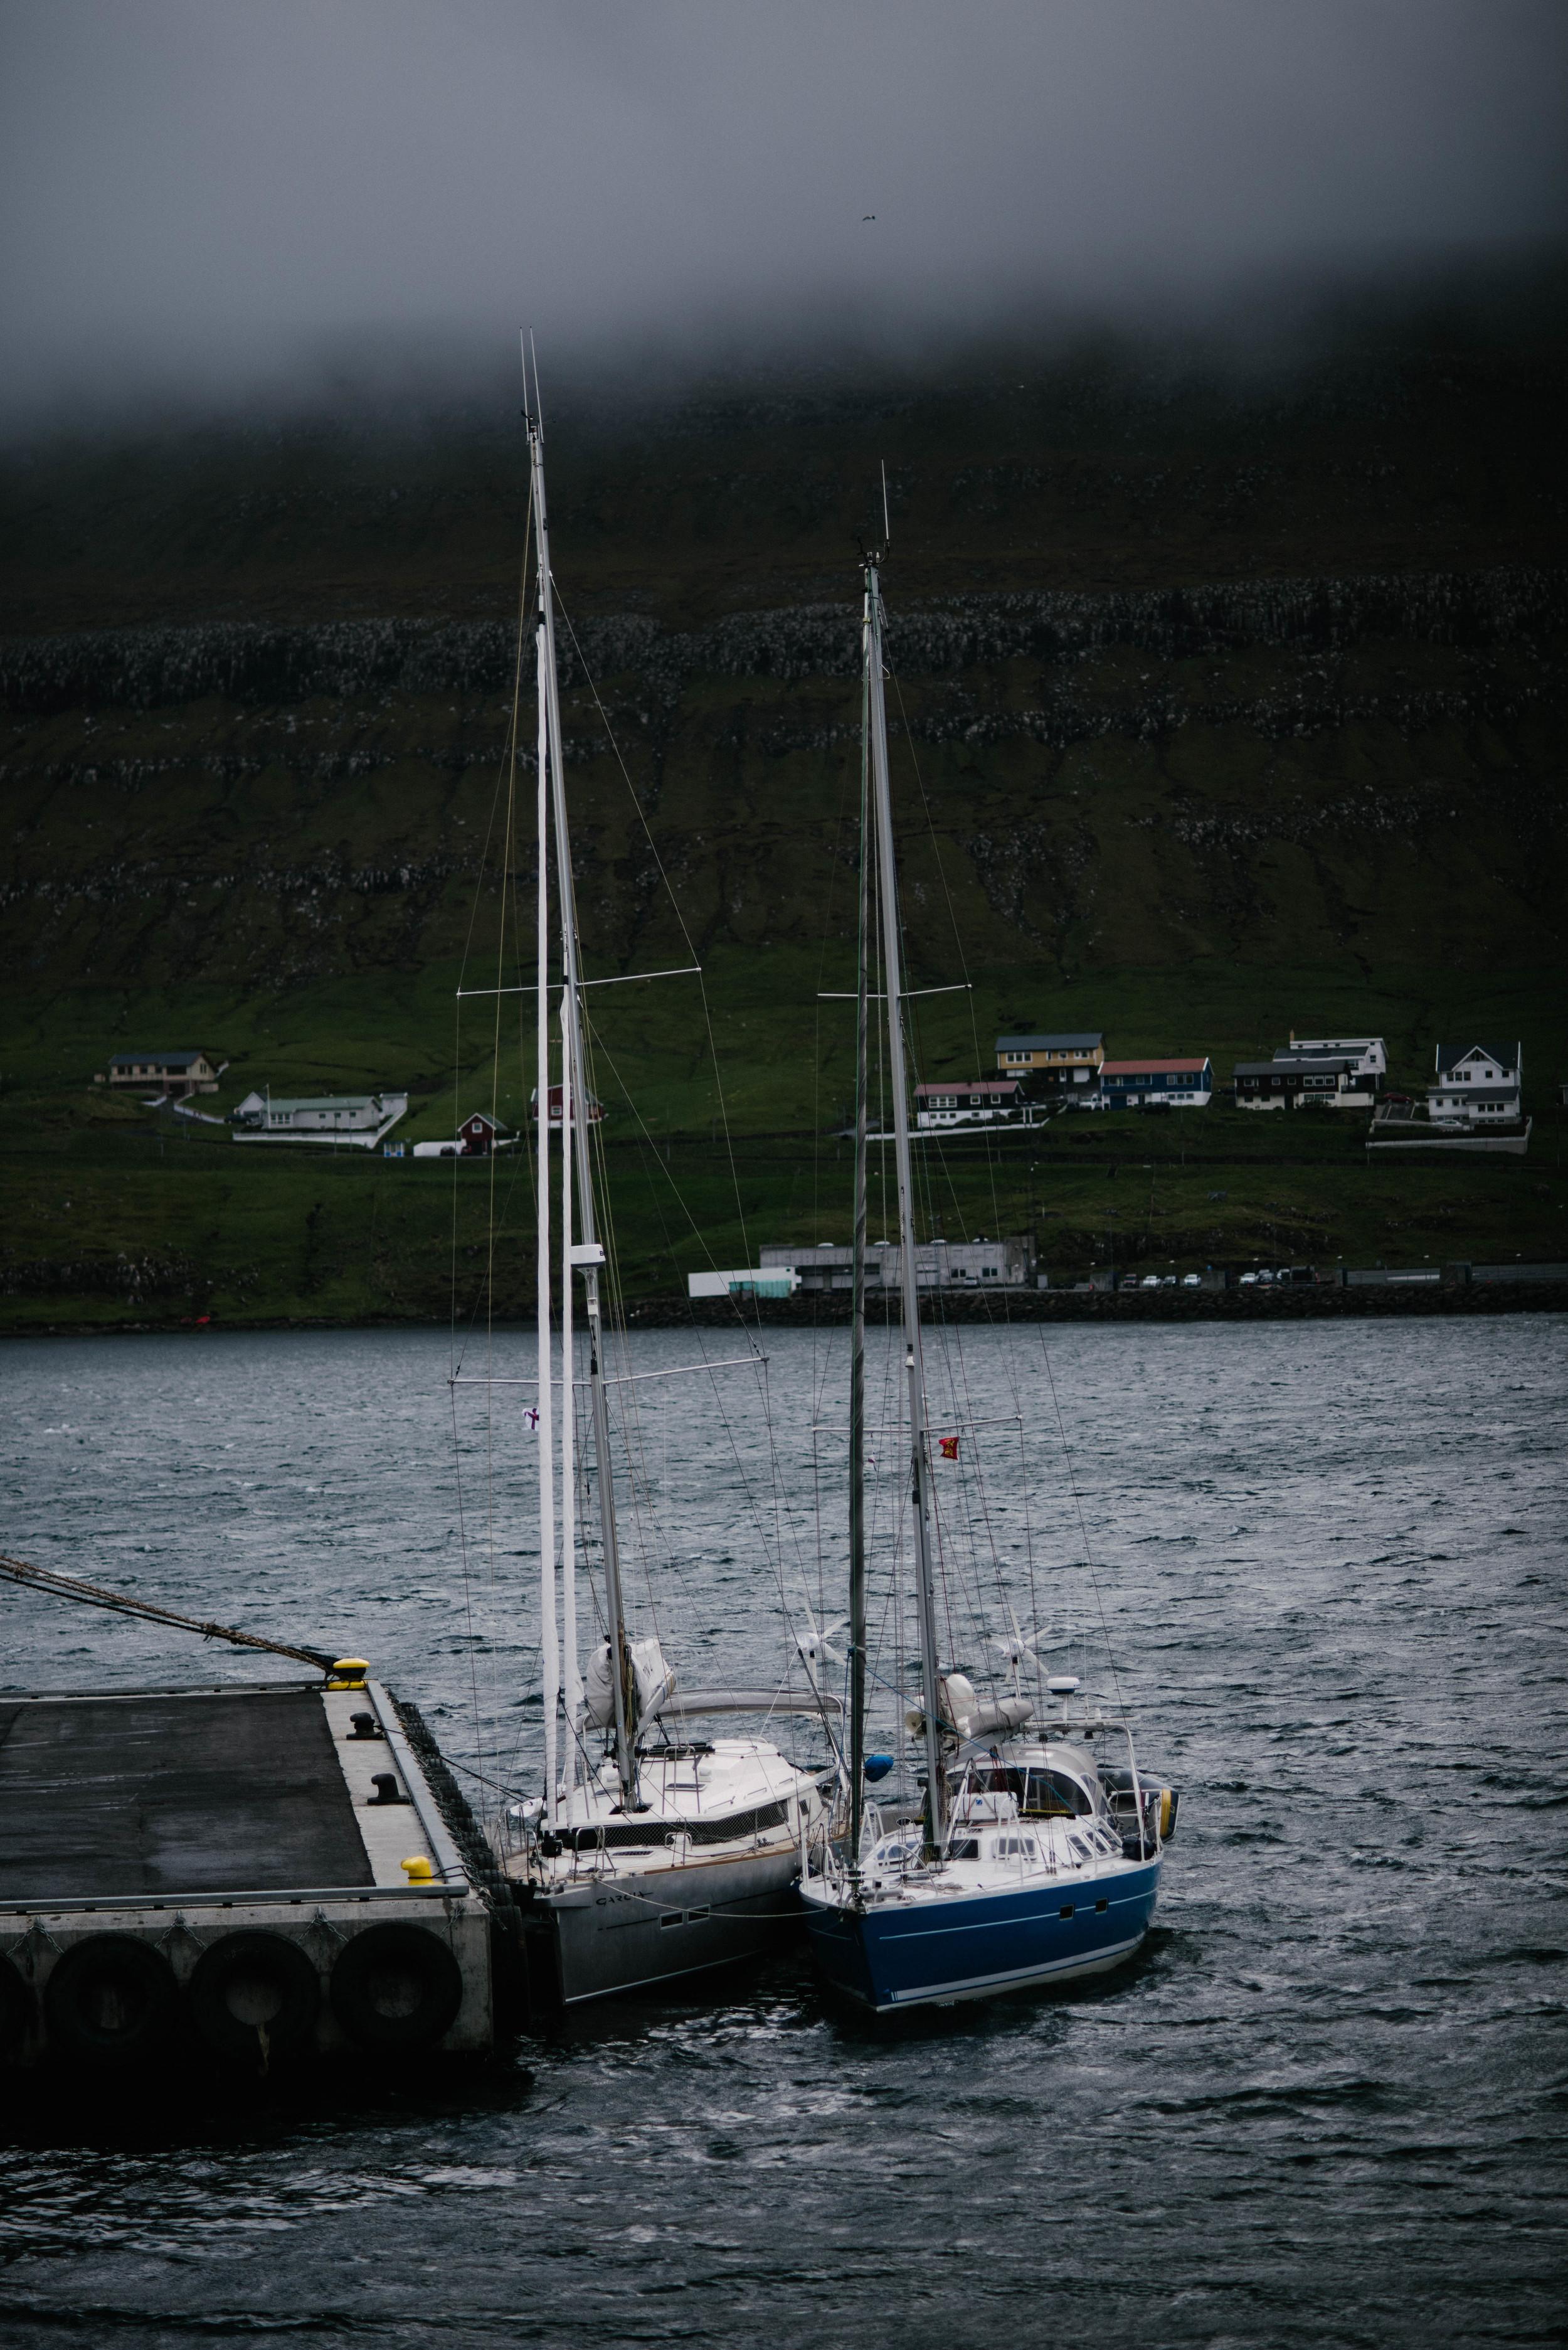 Faroes_Torshavn_1-6452.jpg